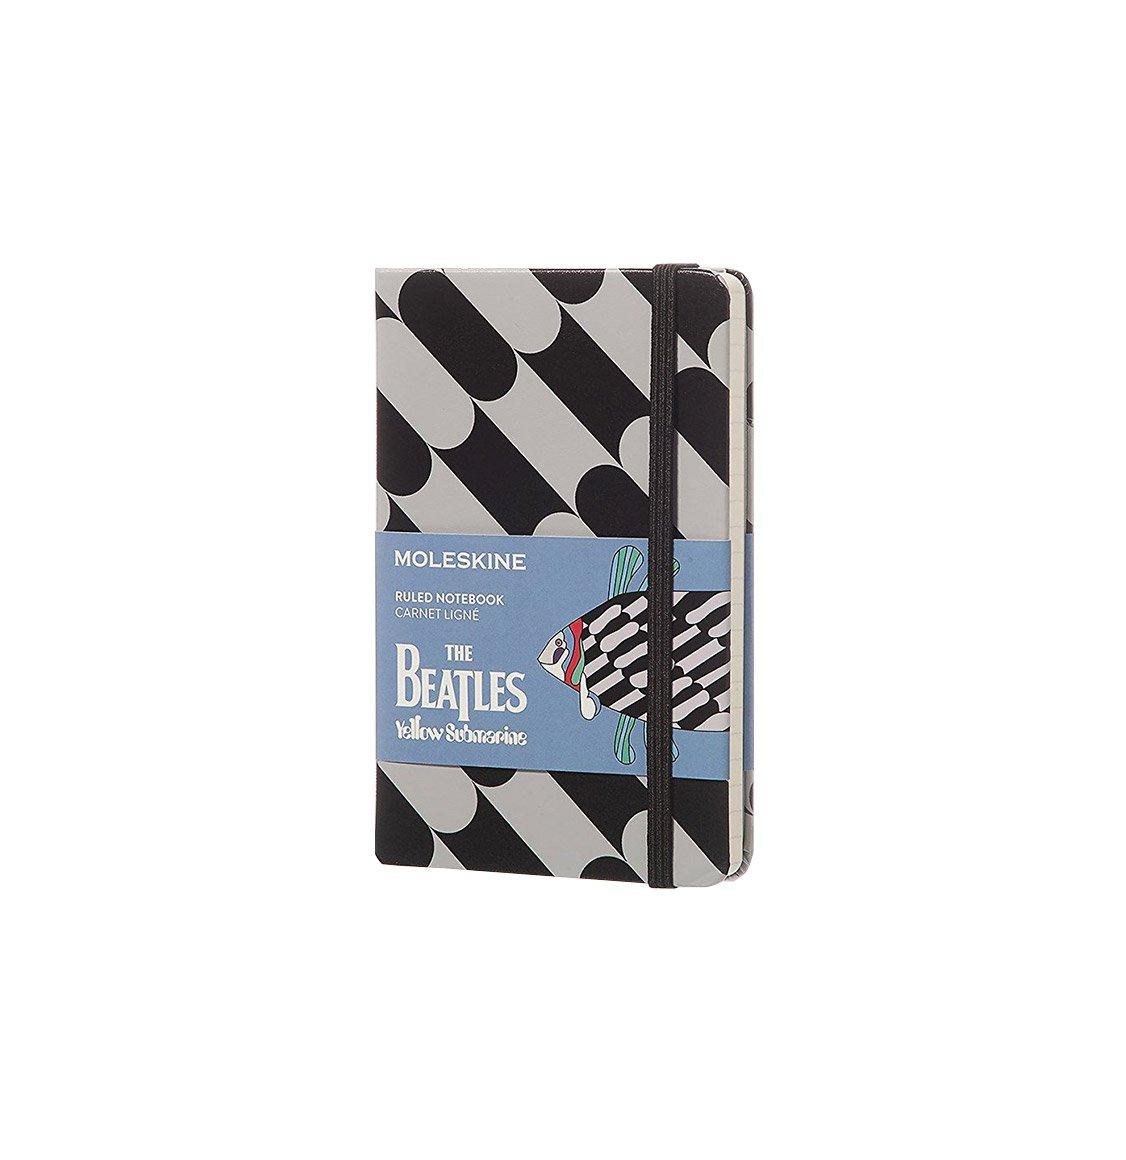 Moleskine The Beatles Limited Edition Pocket Ruled Notebook Black Fish